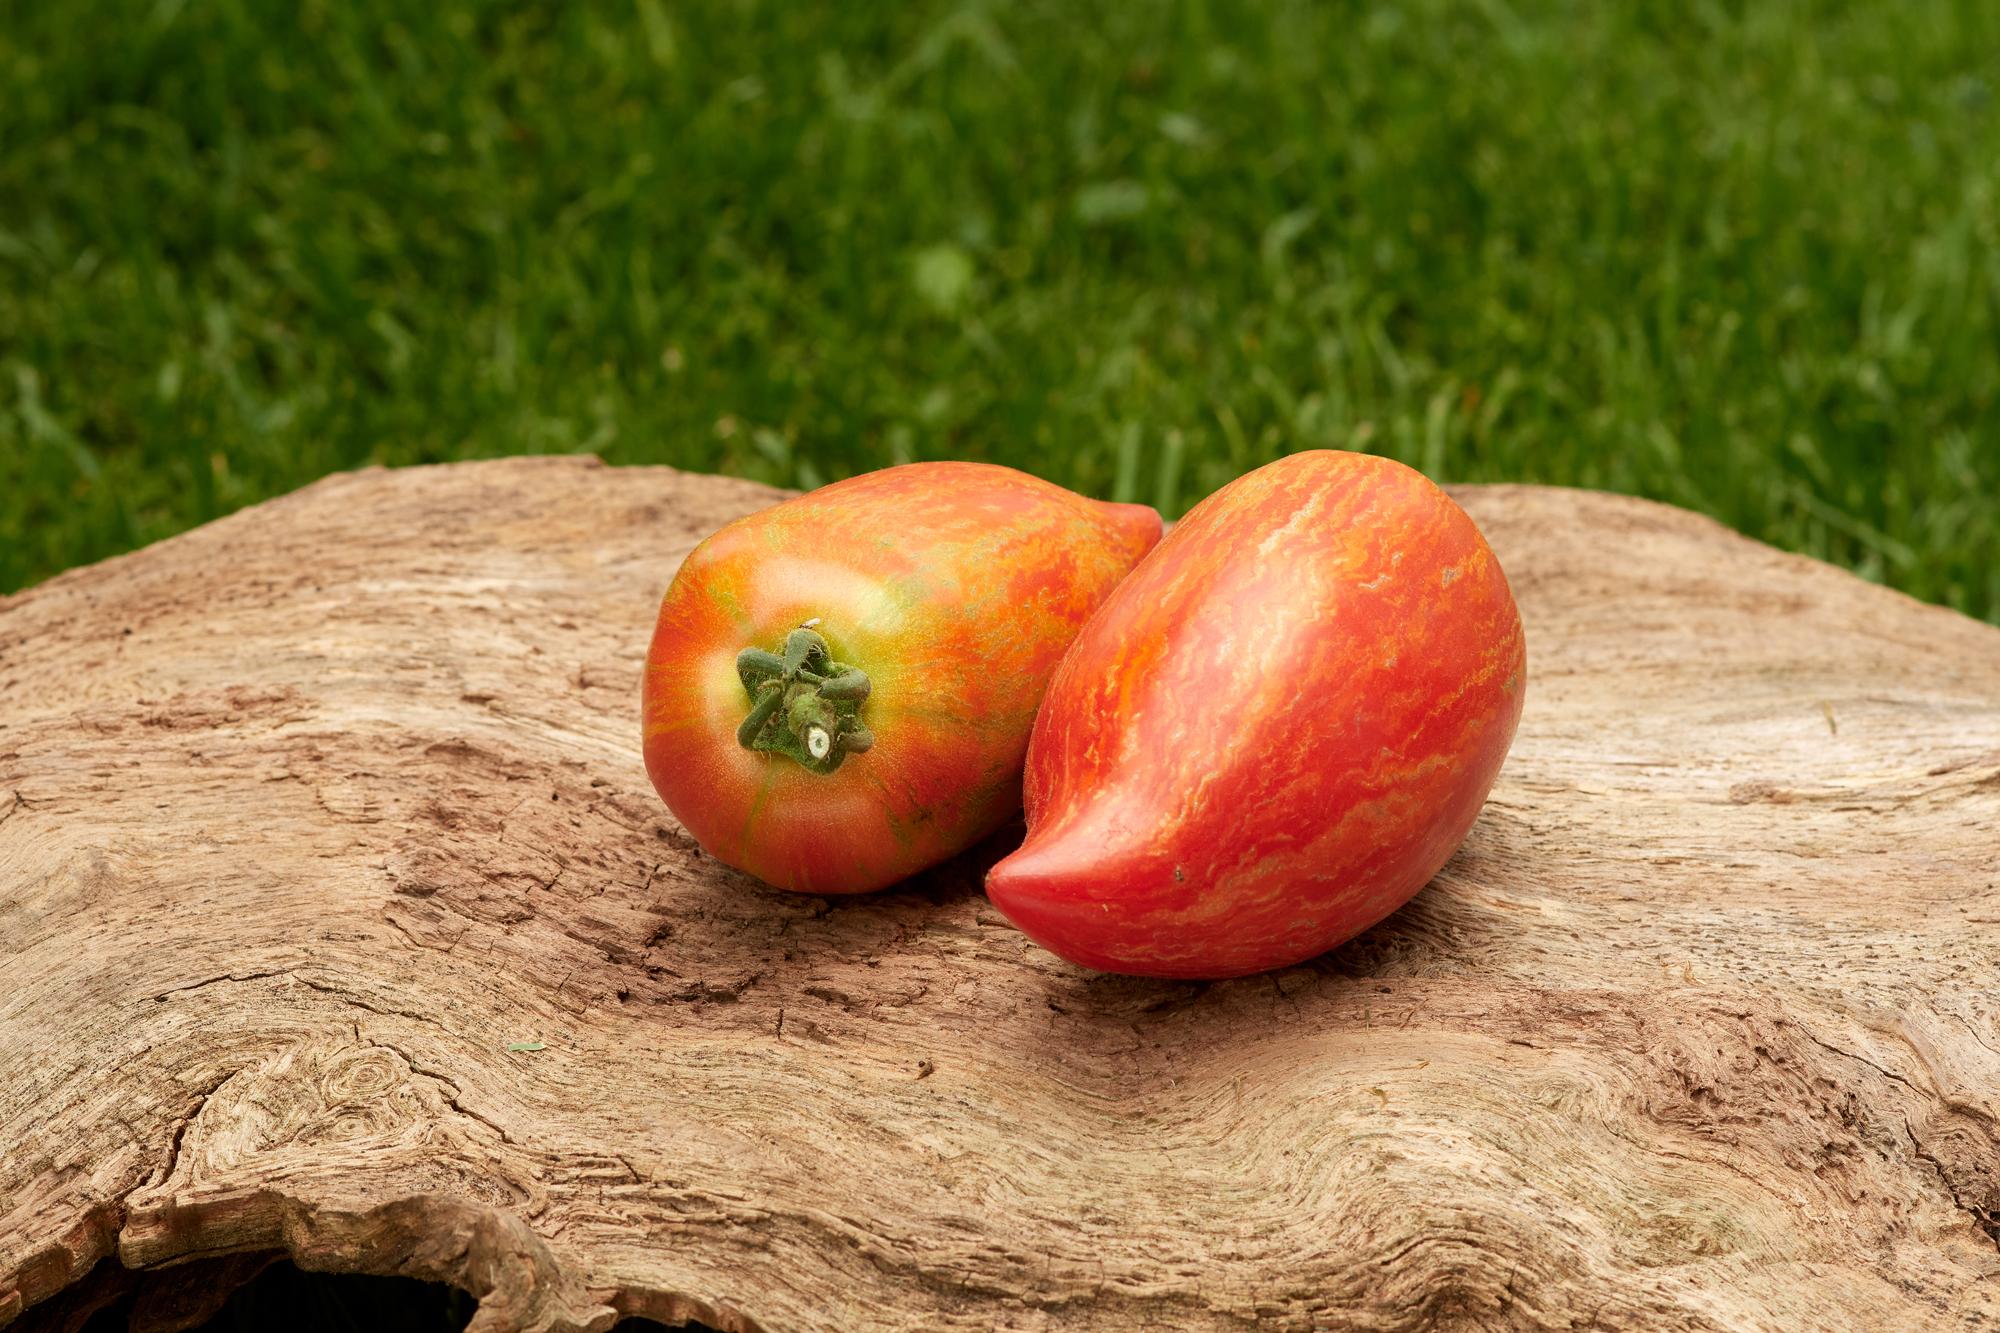 Tomate: Striped Roman